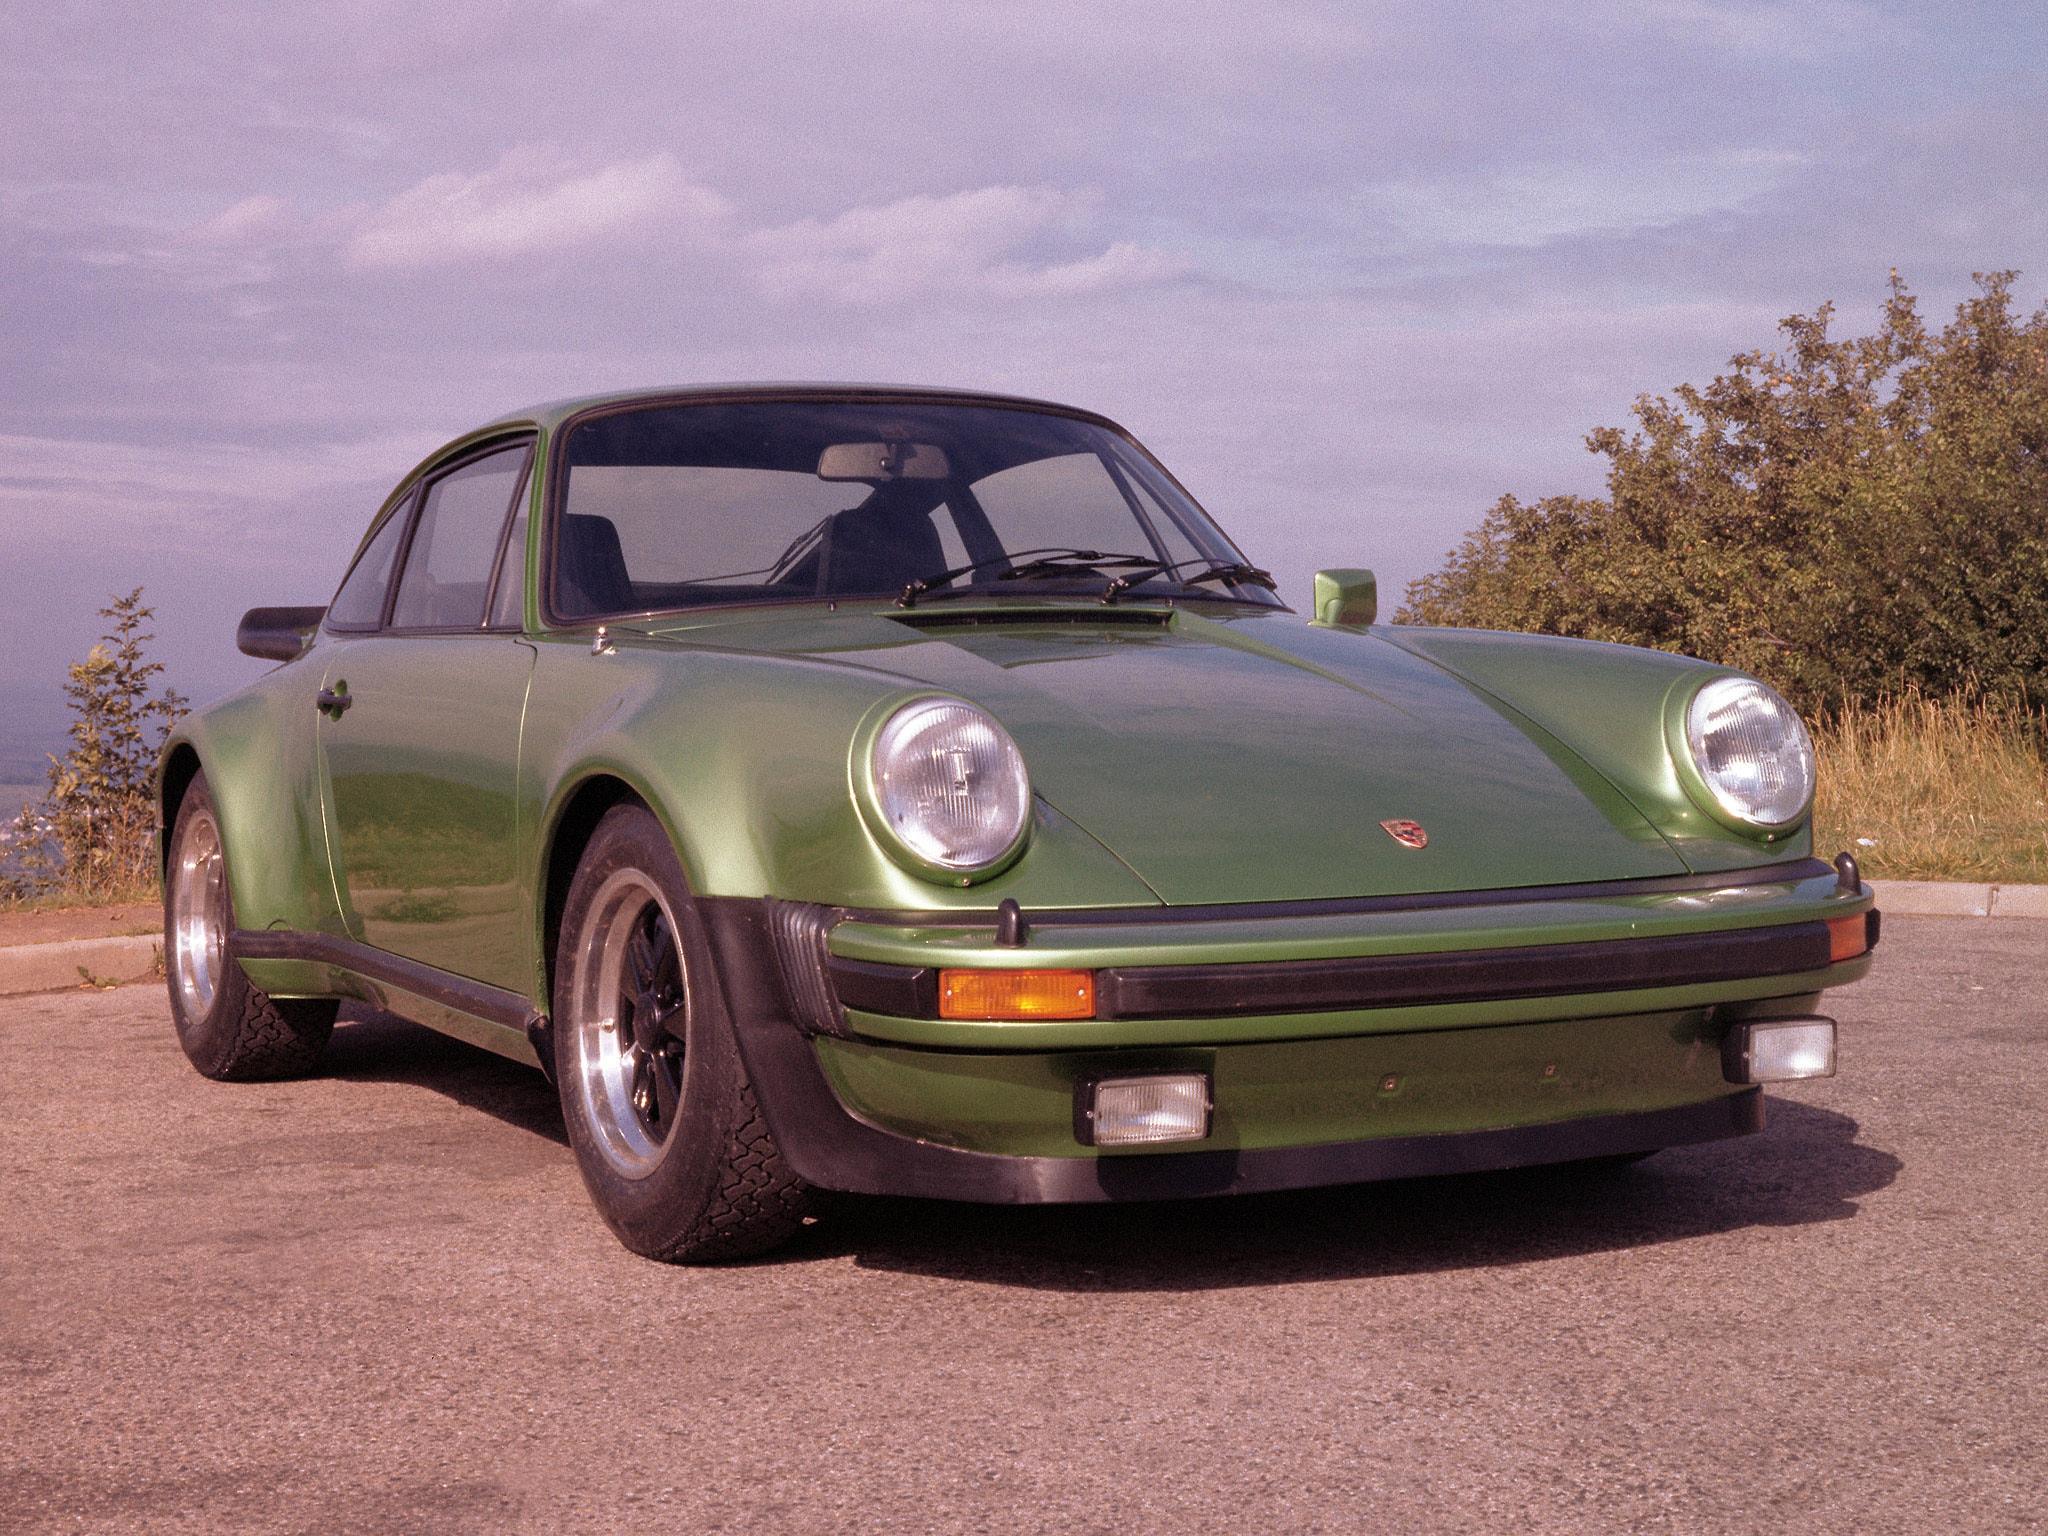 1976 Porsche 911 Turbo (930) widescreen wallpapers